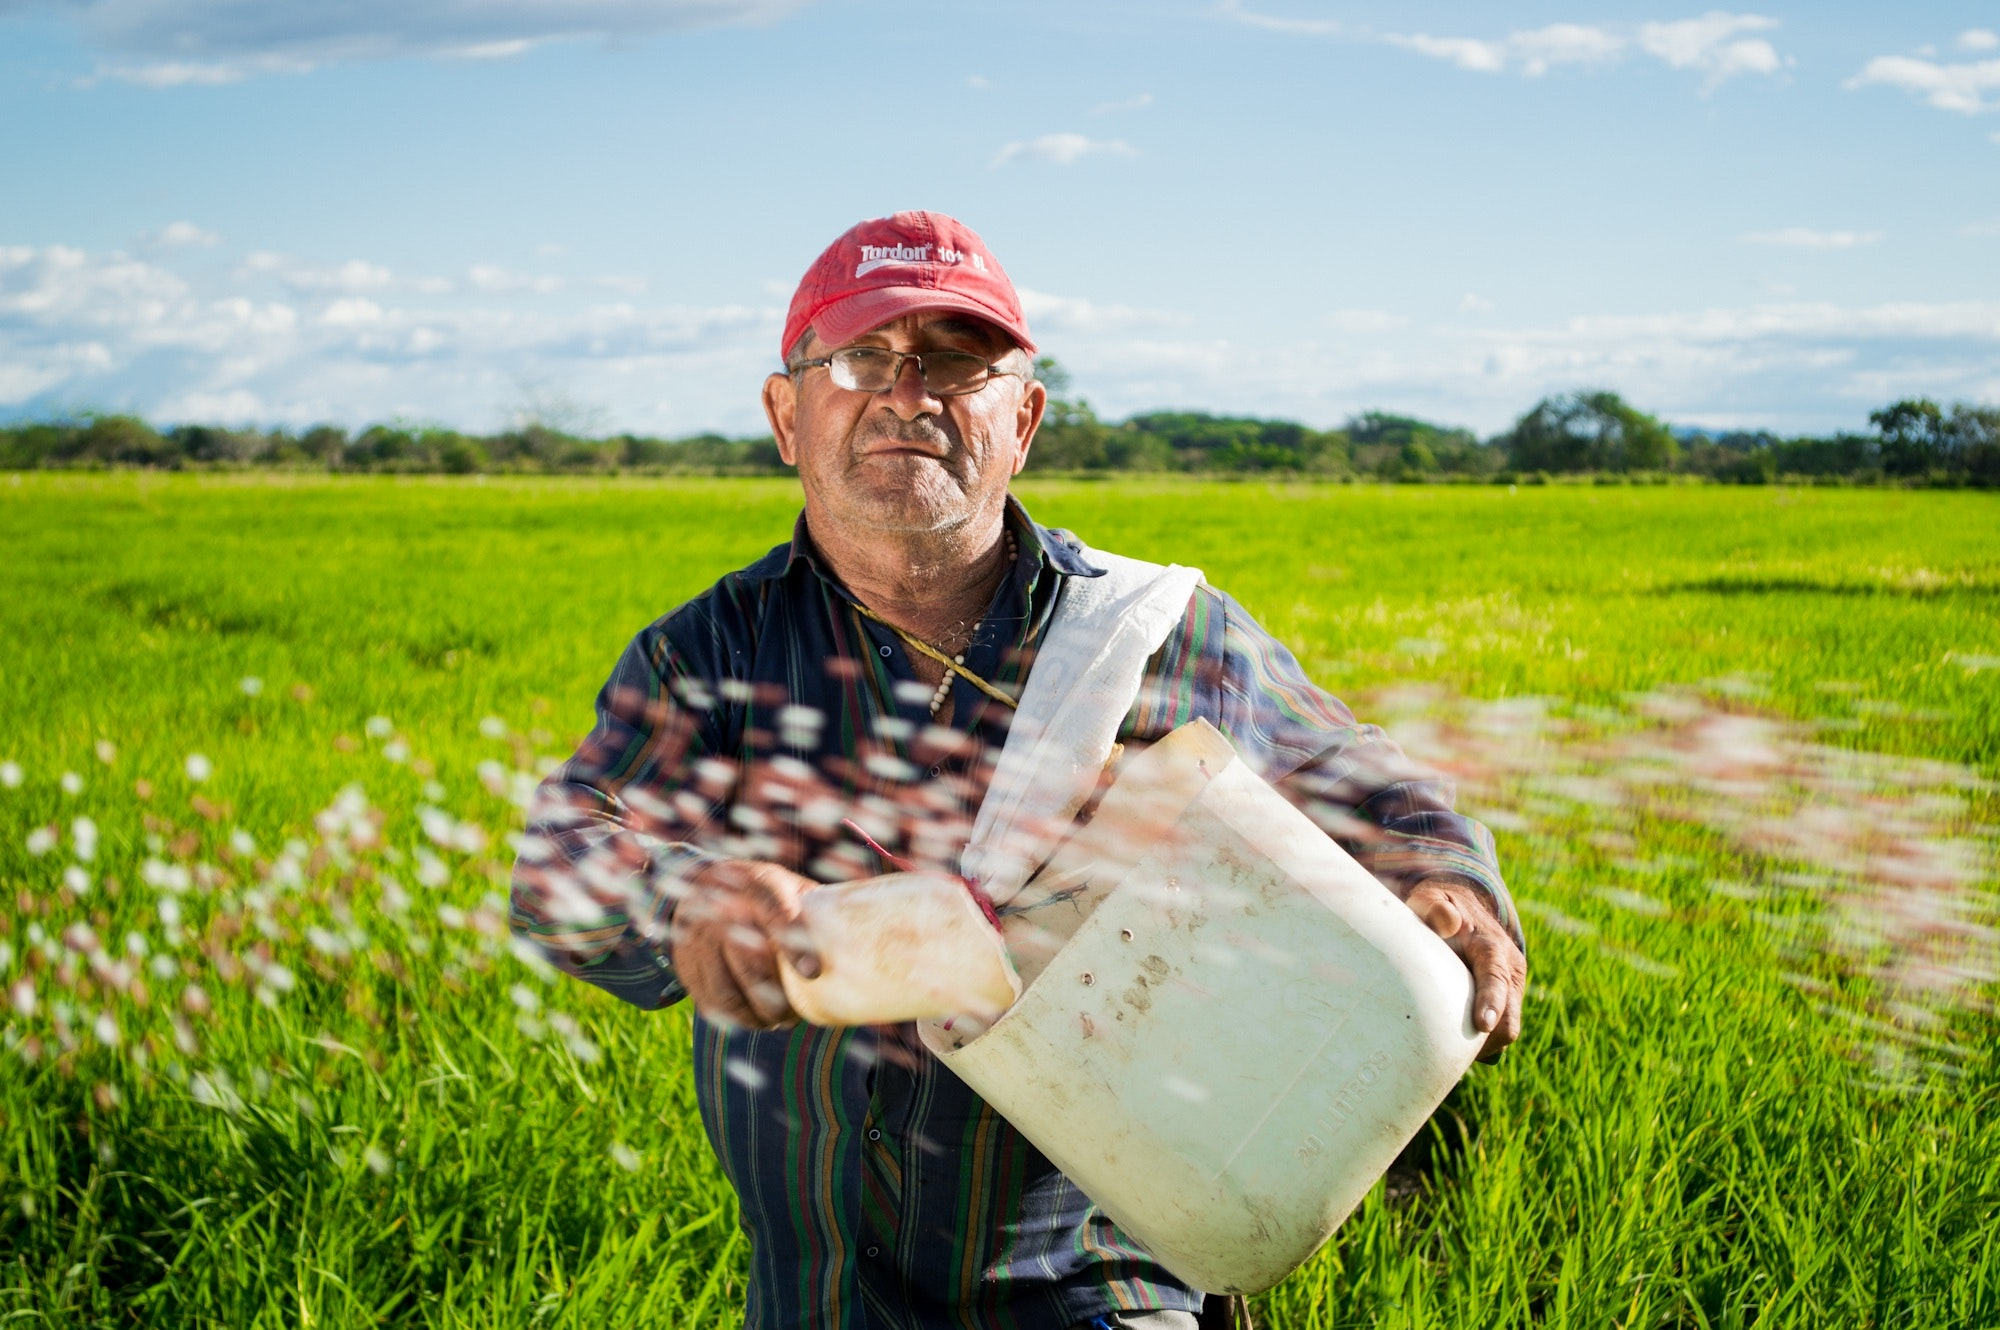 Testimonial: Duurzaame landbouw over de Frans-Vlaamse grens